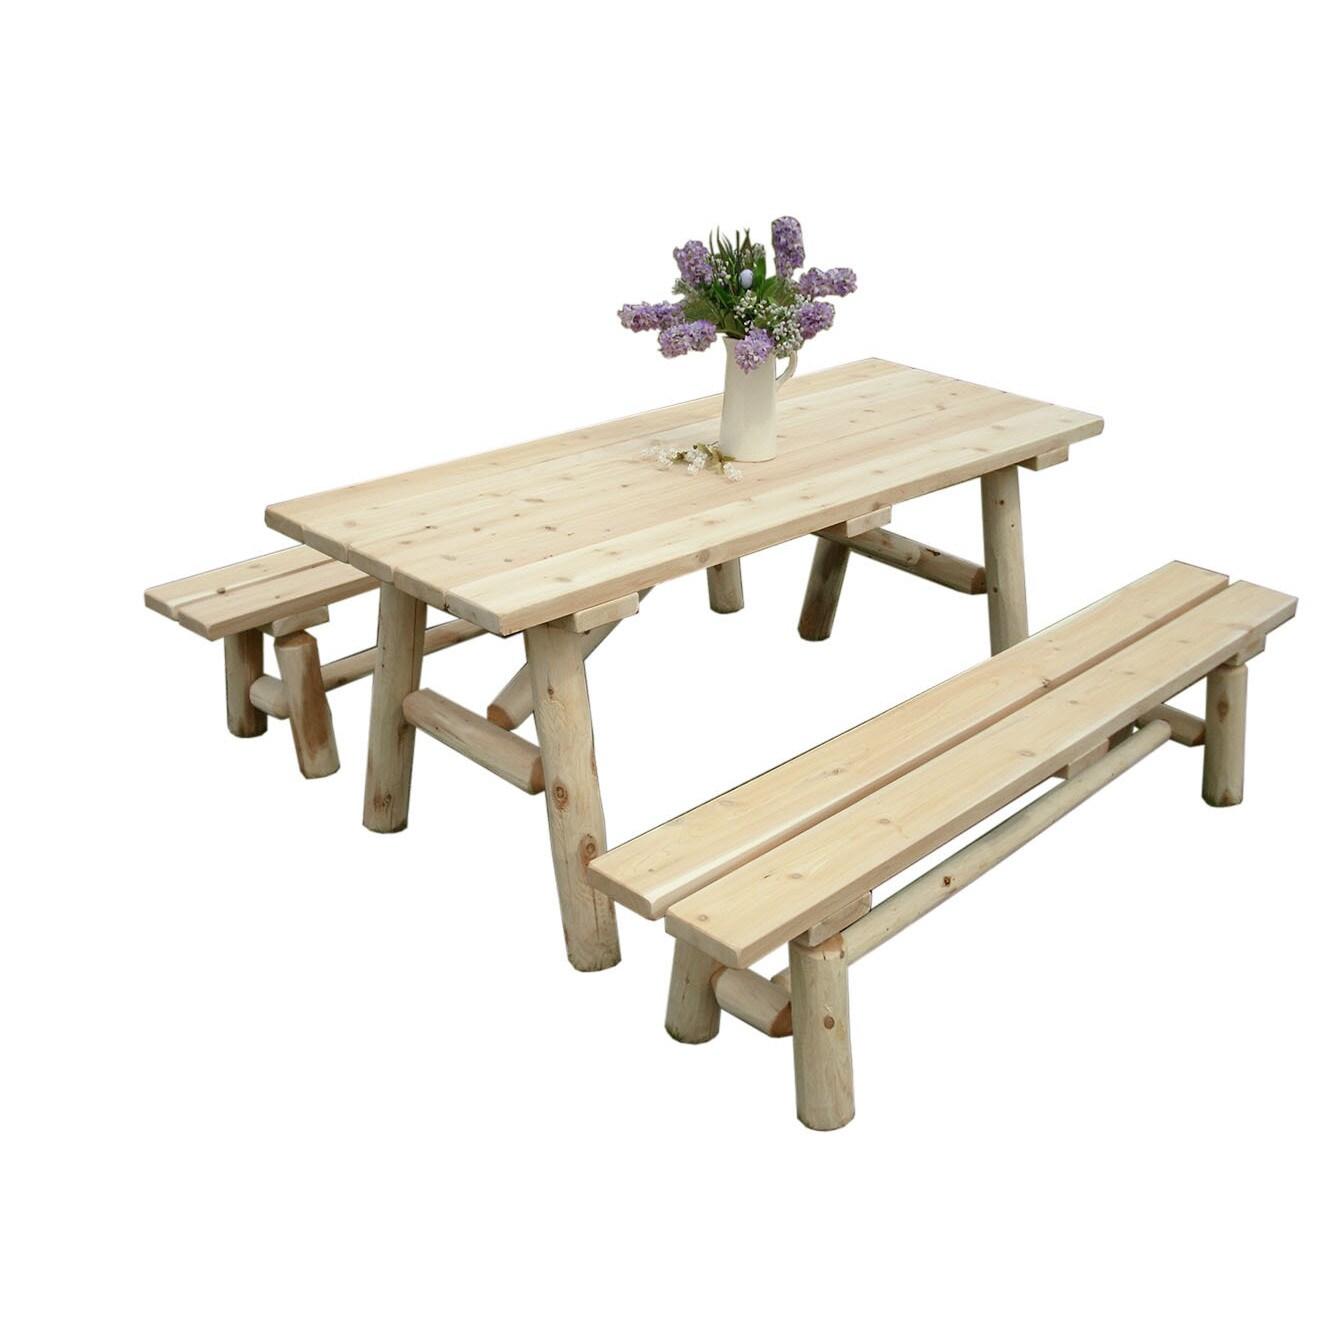 Awe Inspiring White Cedar Log Traditional Picnic Table With Detached Benches Creativecarmelina Interior Chair Design Creativecarmelinacom